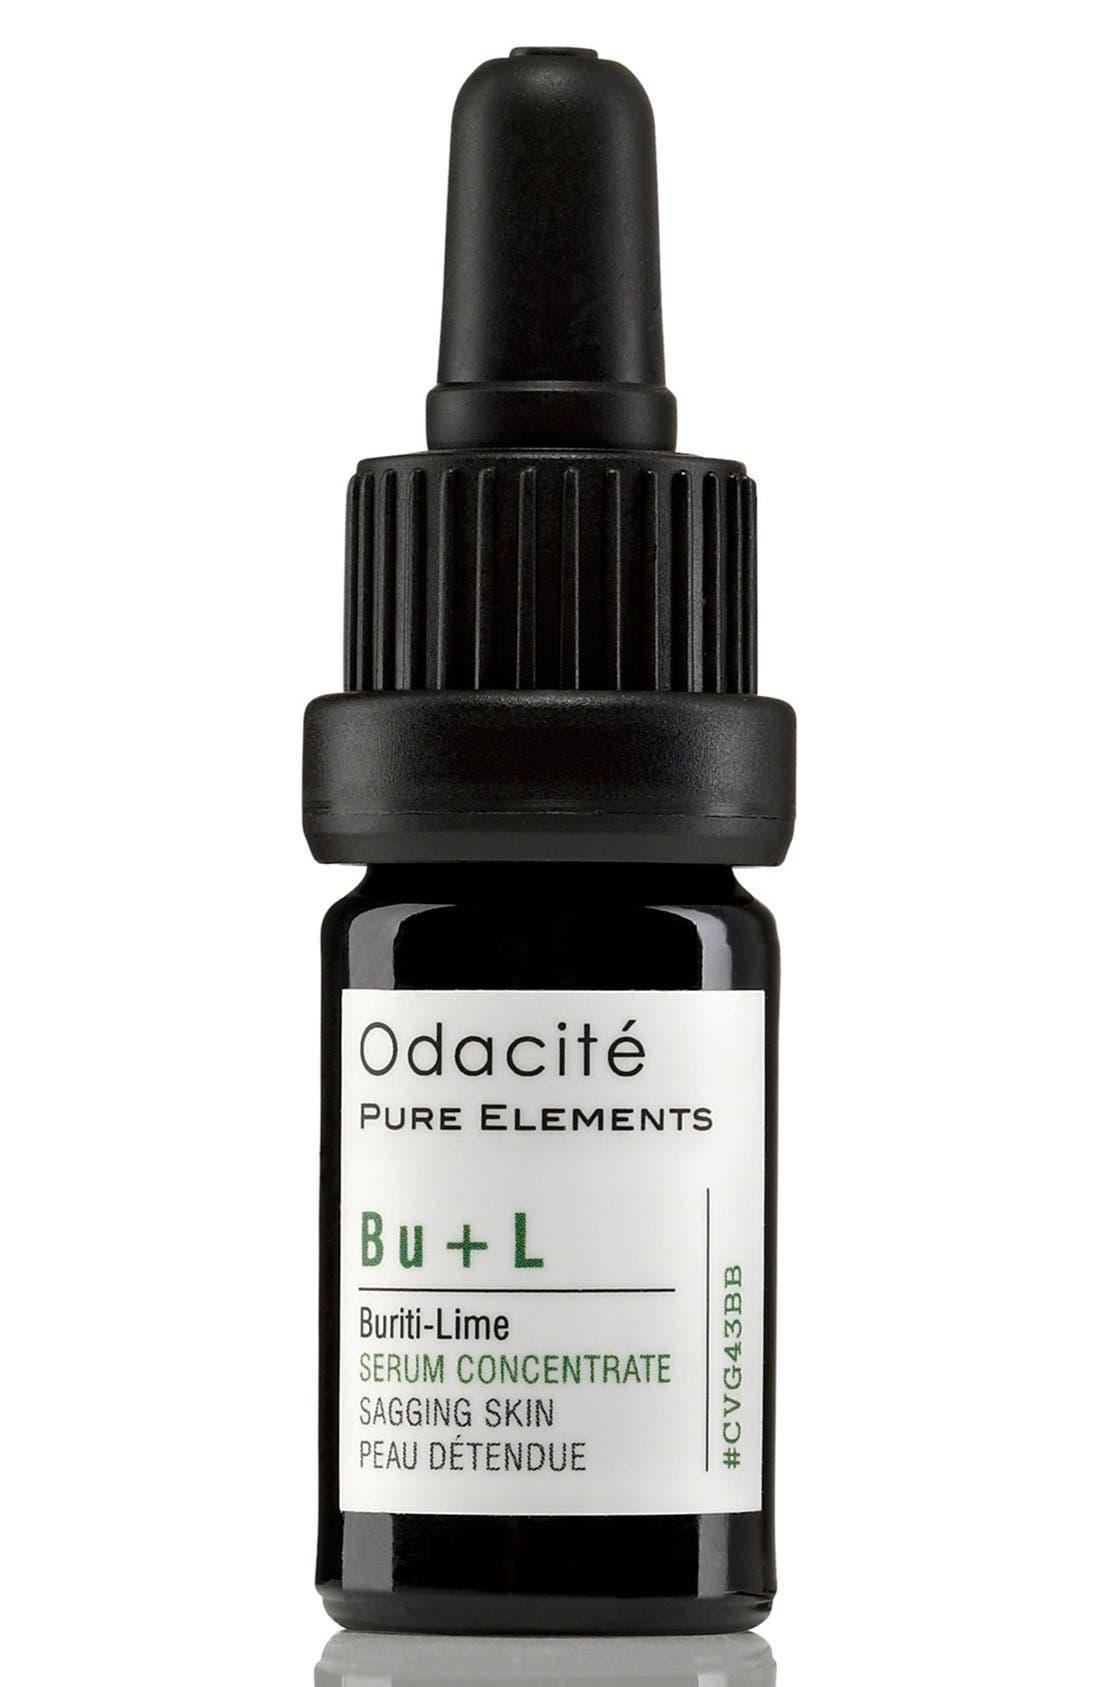 Odacité Bu + L Buriti-Lime Sagging Skin Facial Serum Concentrate